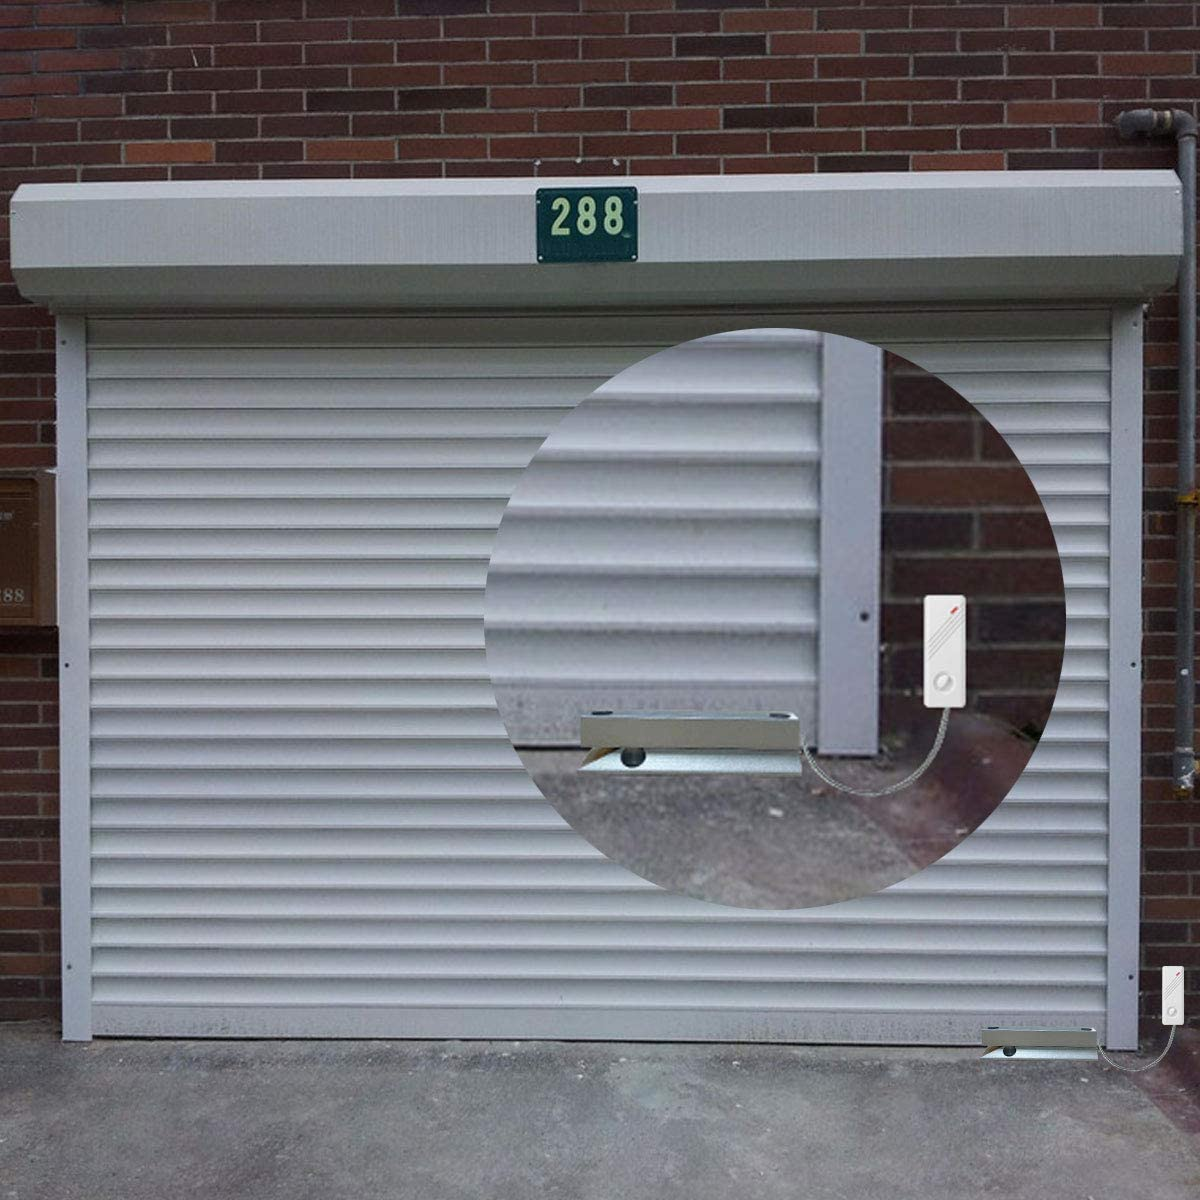 Contacto para puerta de garaje de metal sensor inal/ámbrico Wolf-Guard MC-J01 persiana met/álica garaje alarma magn/ética para tienda